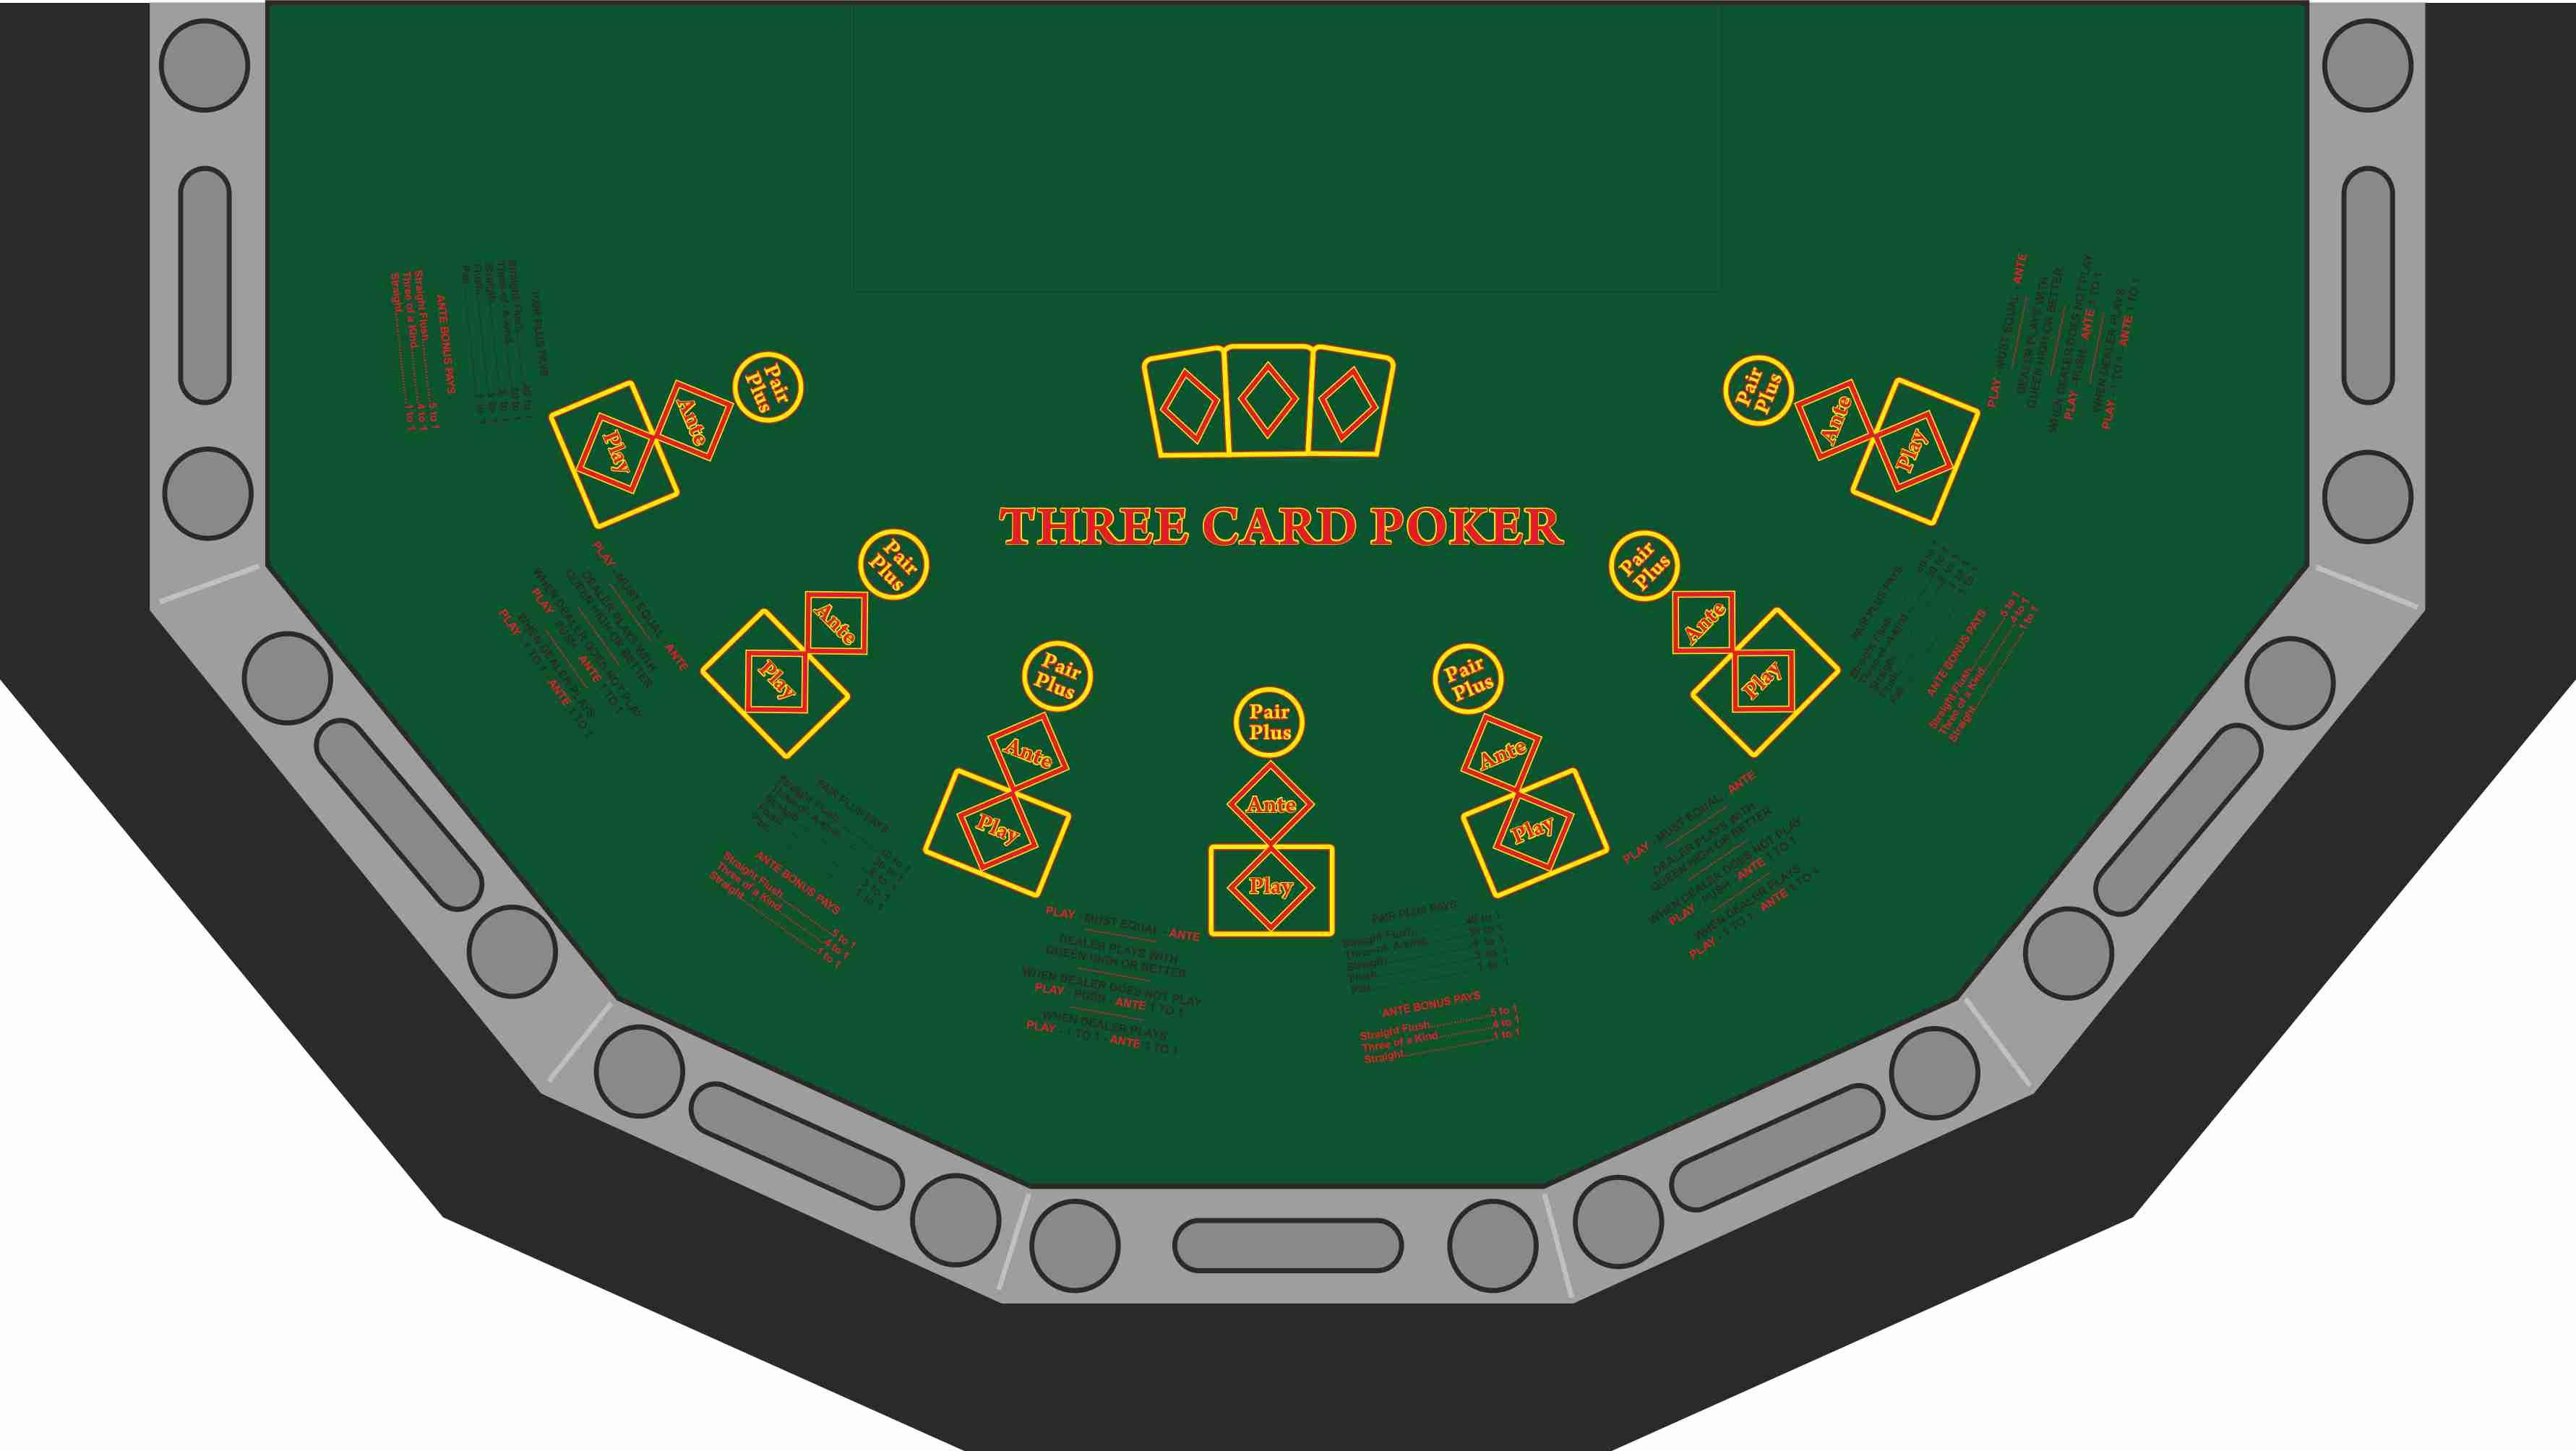 Tricard Poker